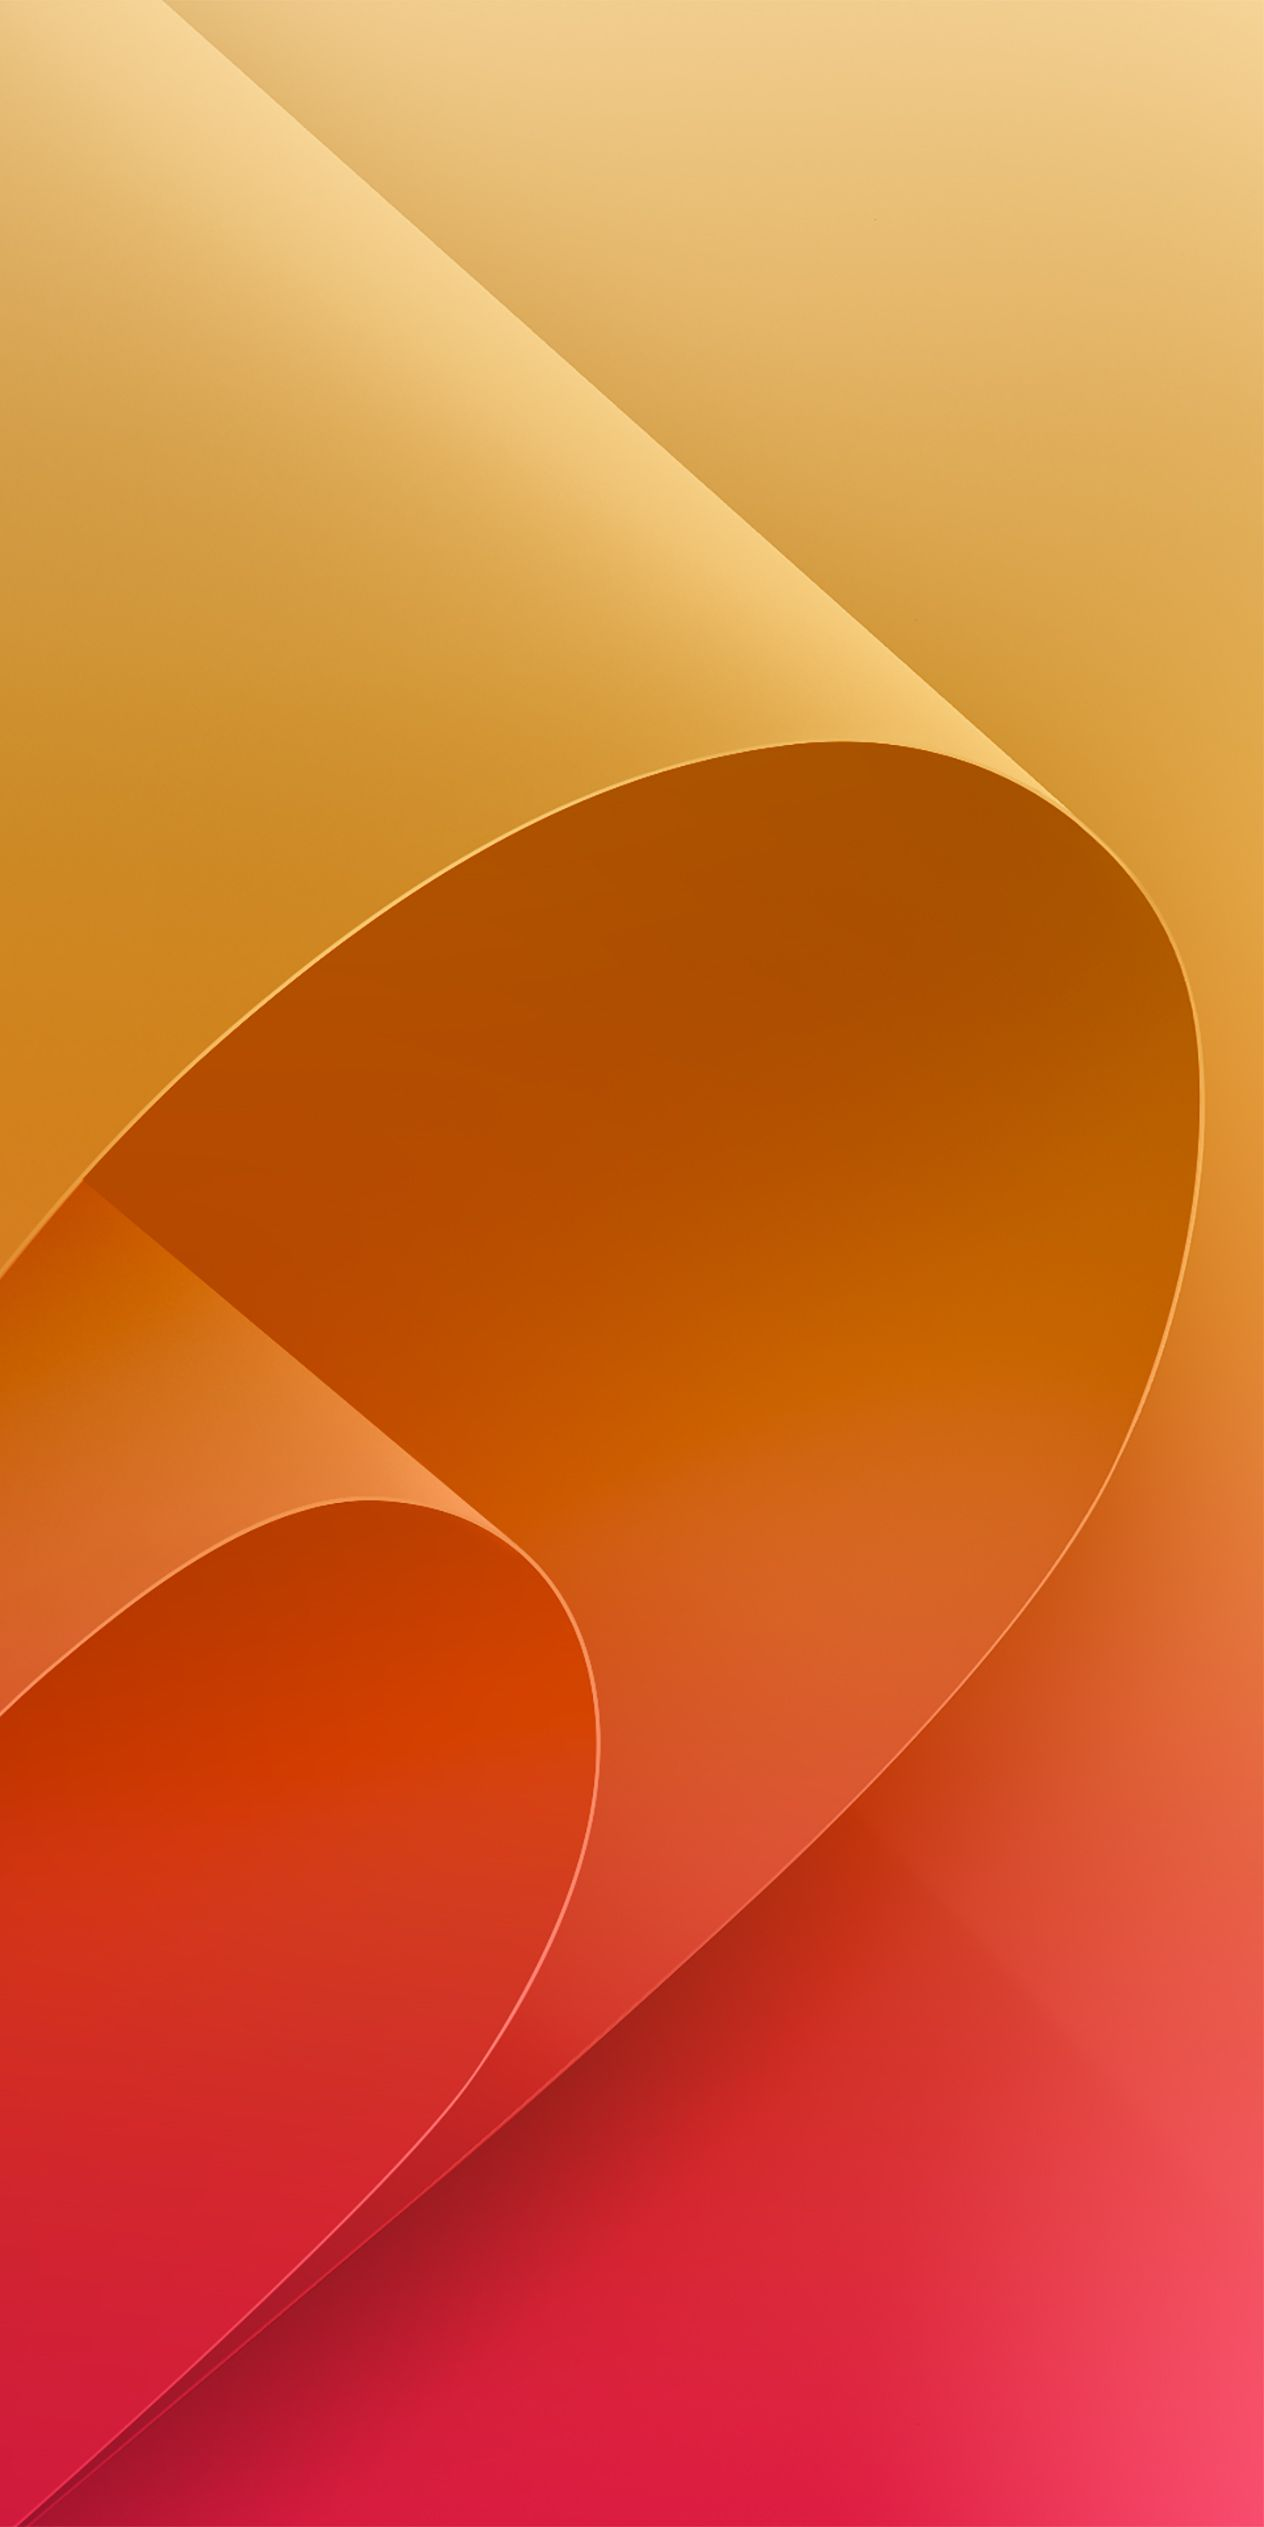 700 Wallpaper Asus Zenfone 5 Hd HD Gratis